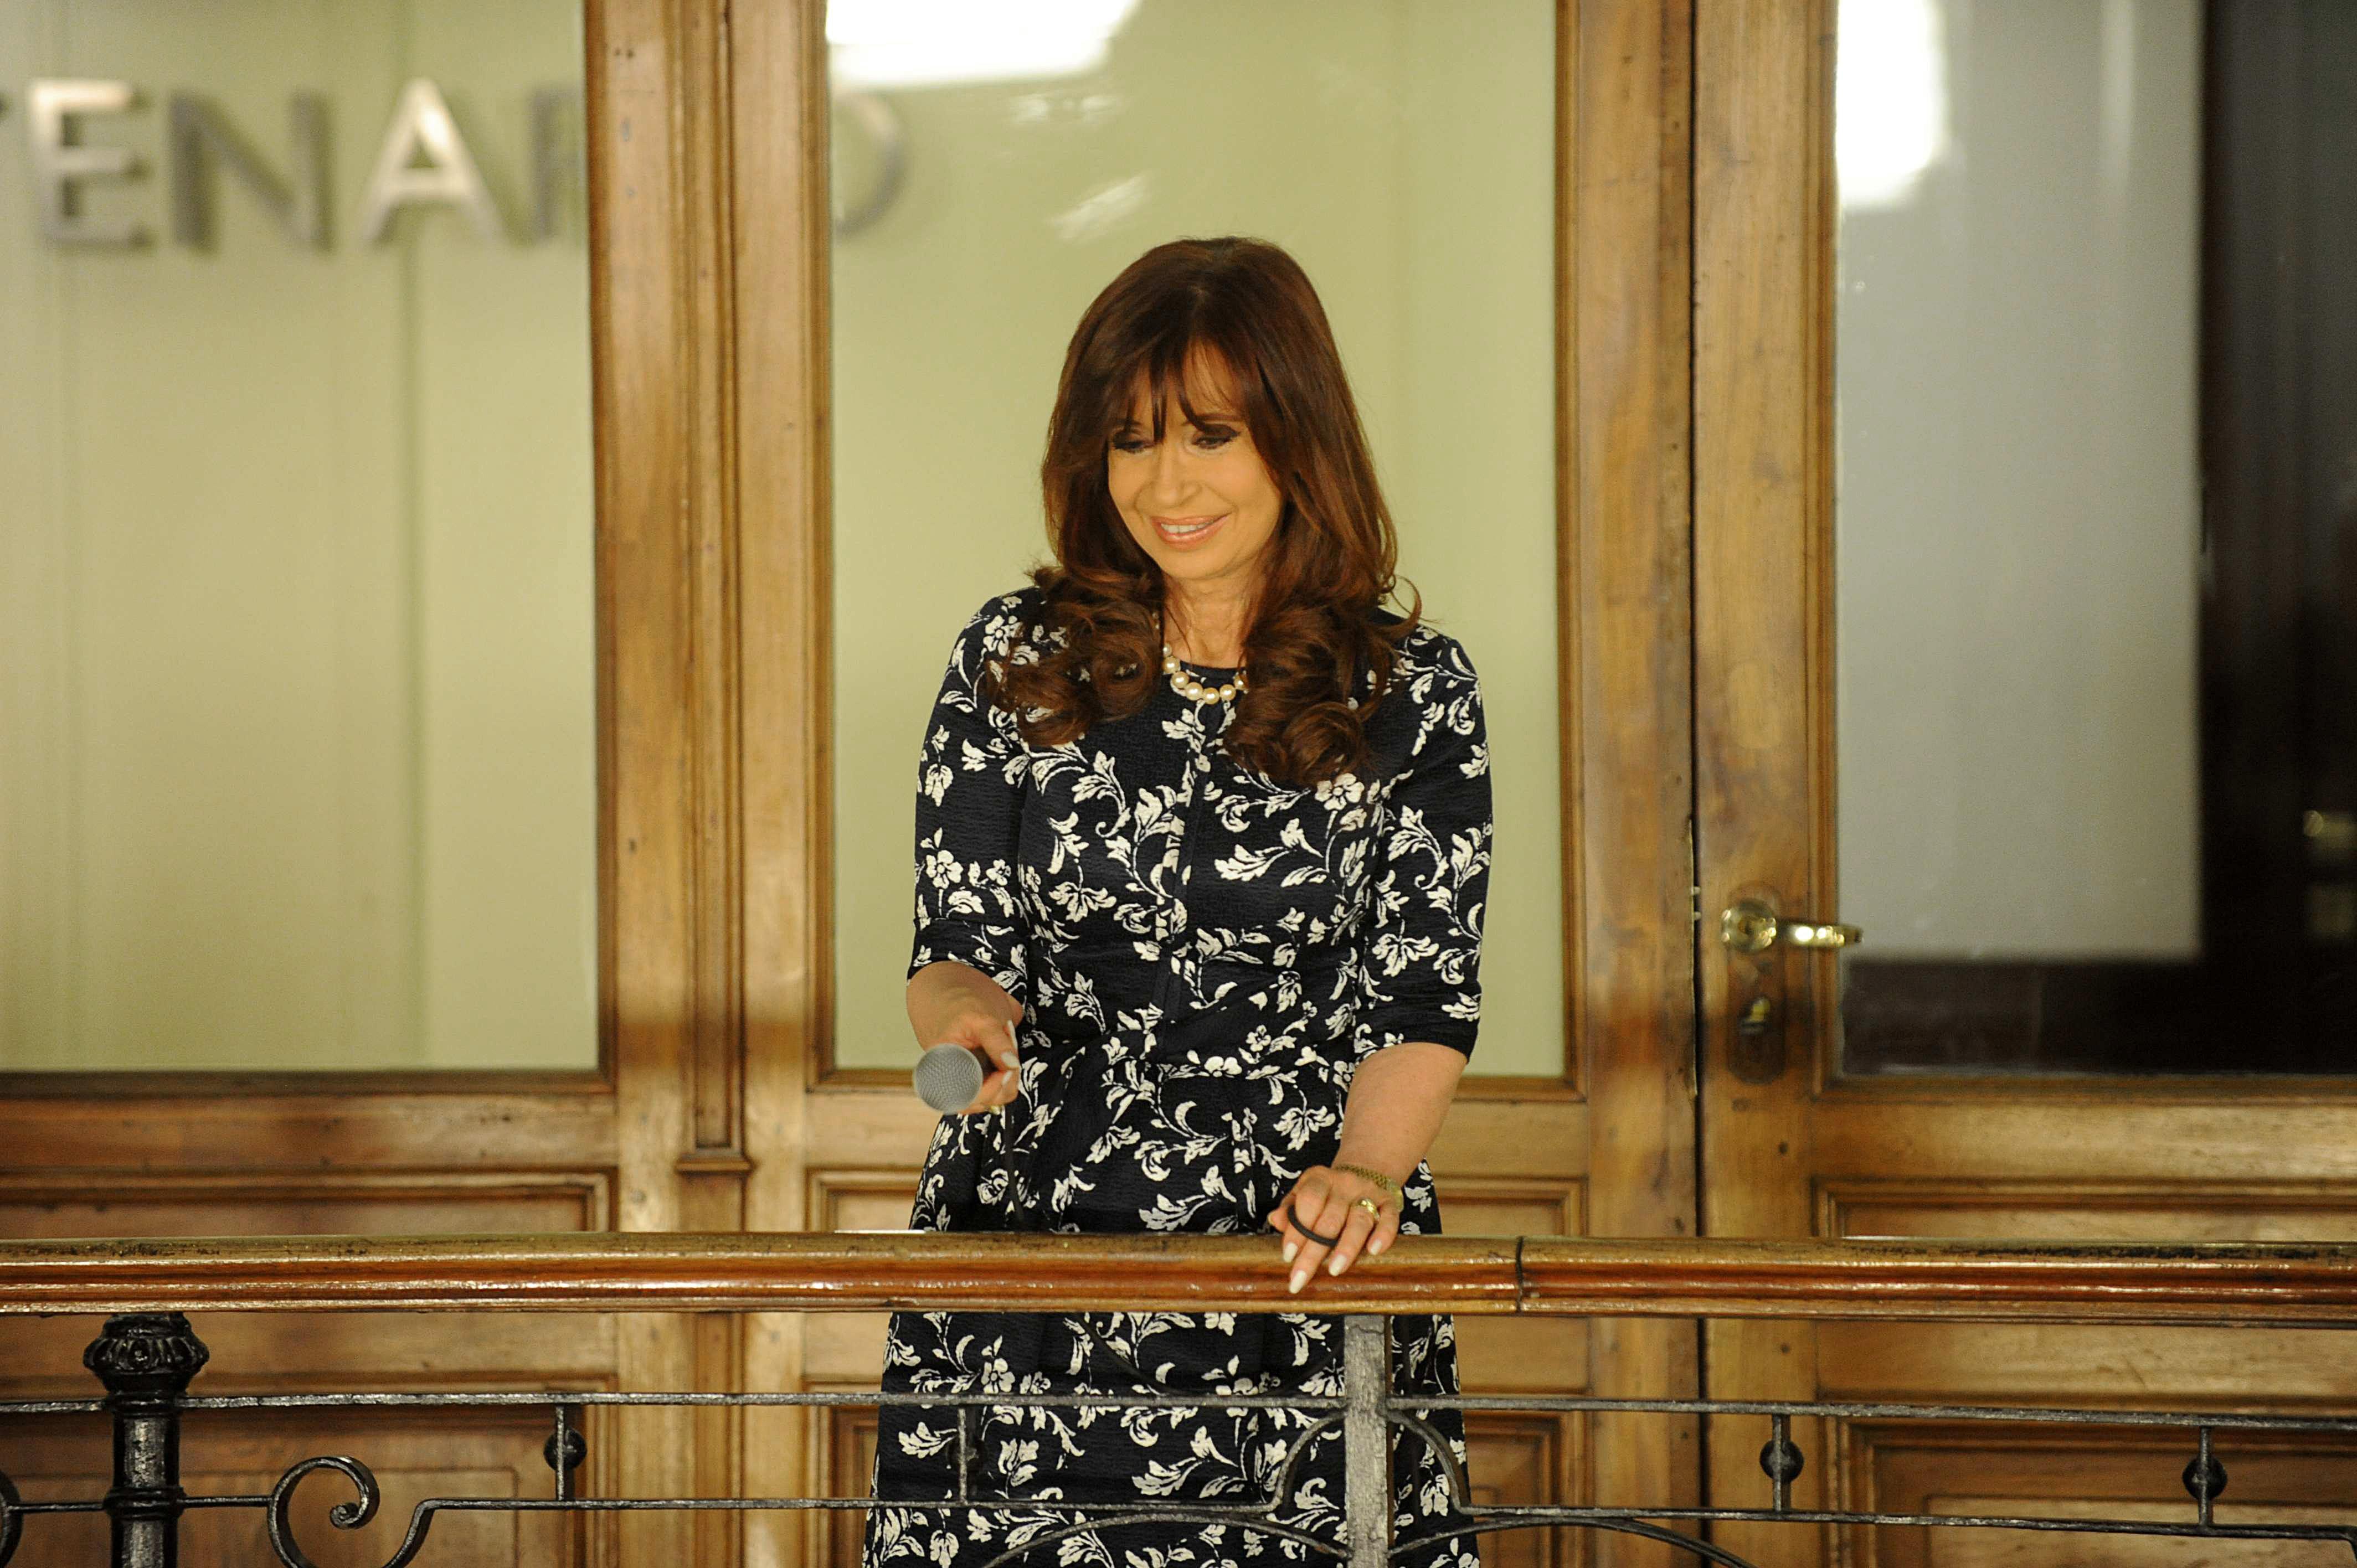 02-07-2015_buenos_aires_la_presidenta_cristina (2)